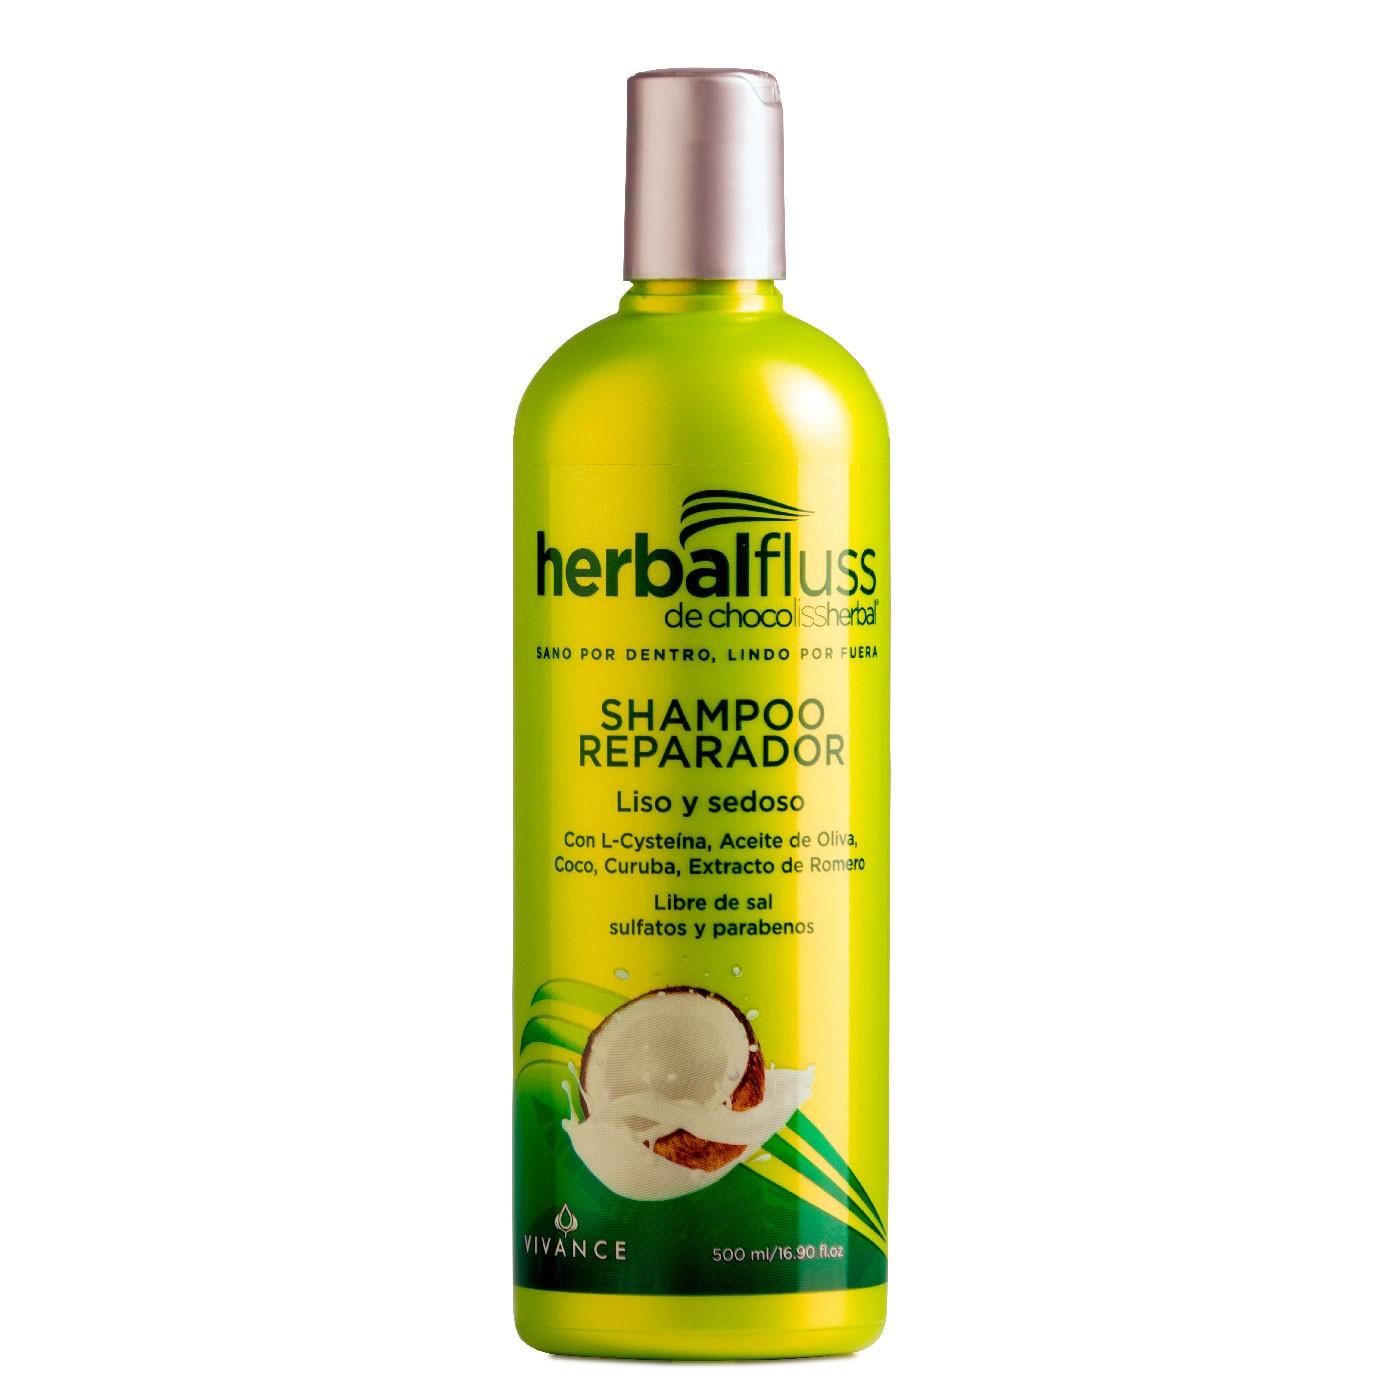 Shampoo Reparador Herbalfluss